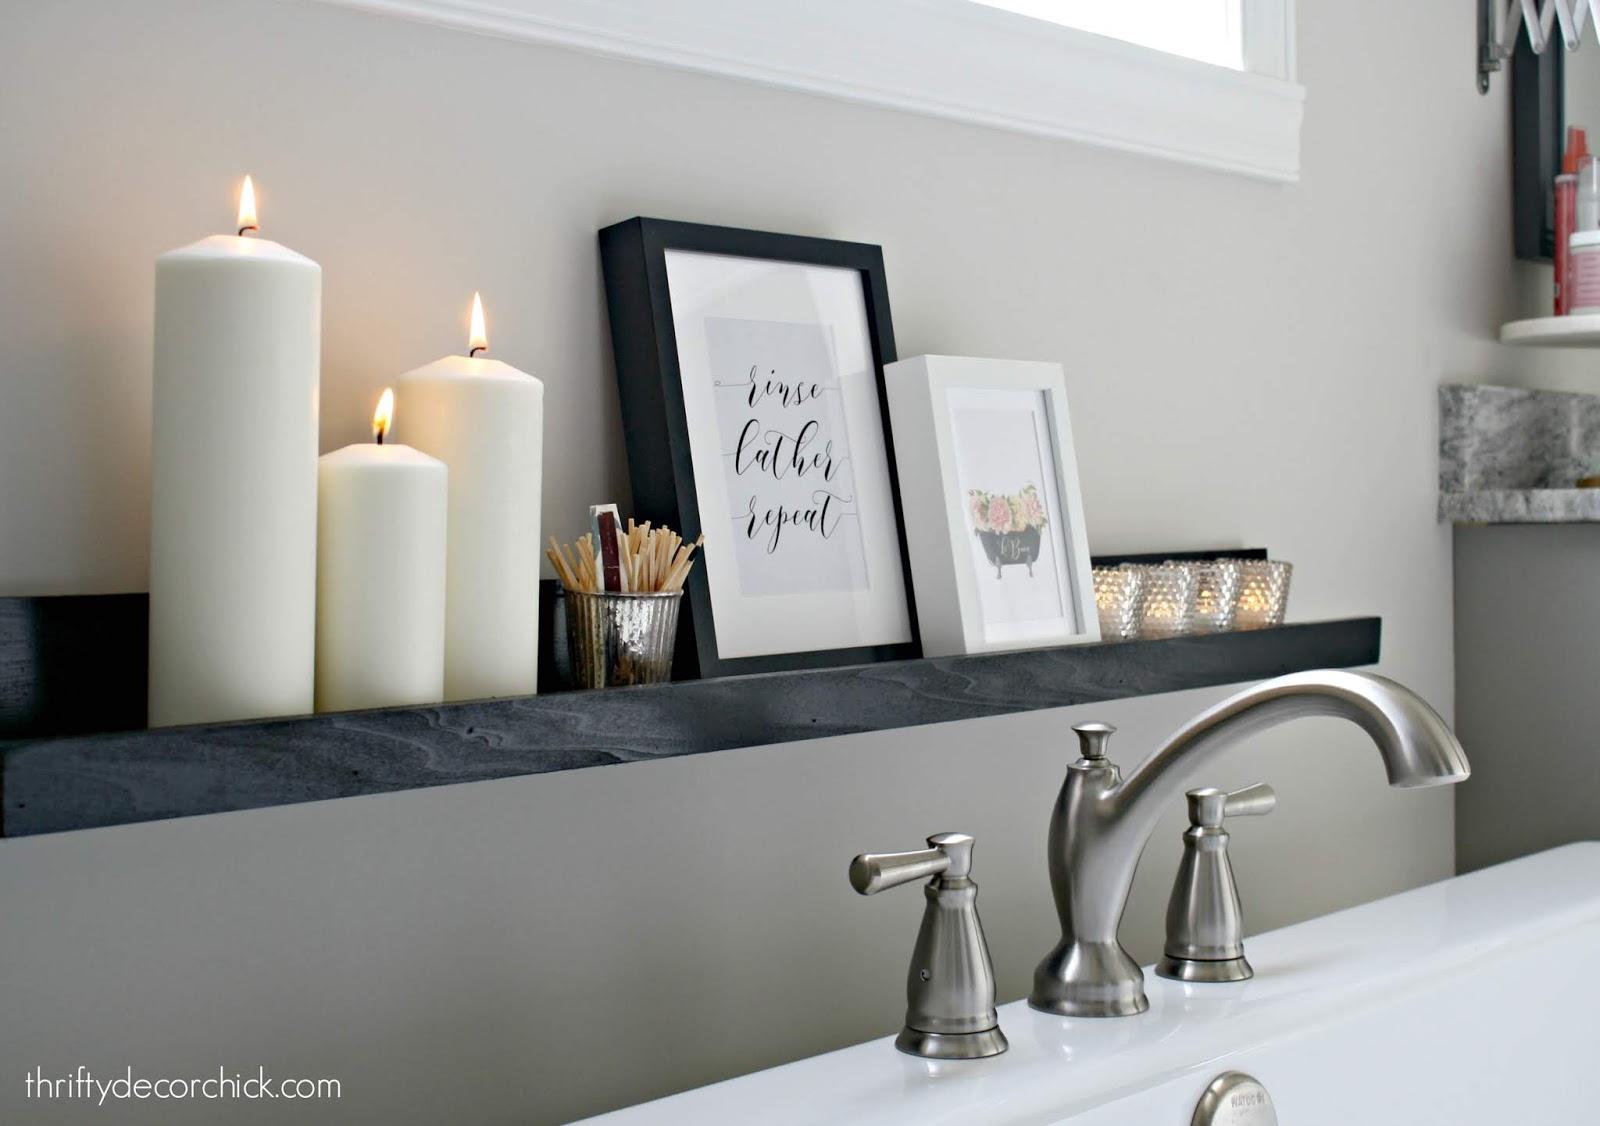 Diy Spa Display Ledge By The Tub, Bathroom Ledge Shelf